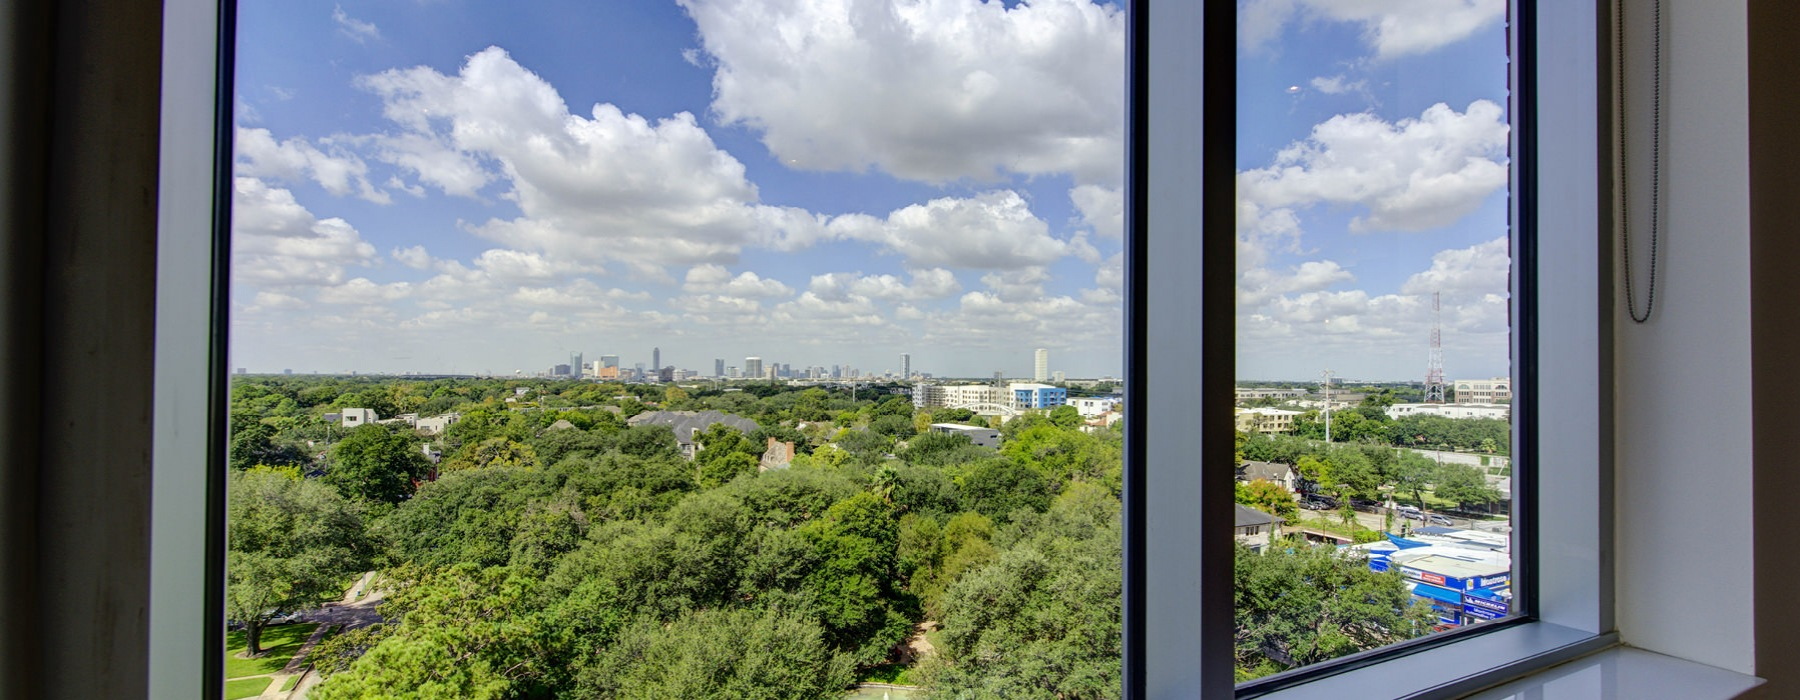 apartment view of Houston skyline